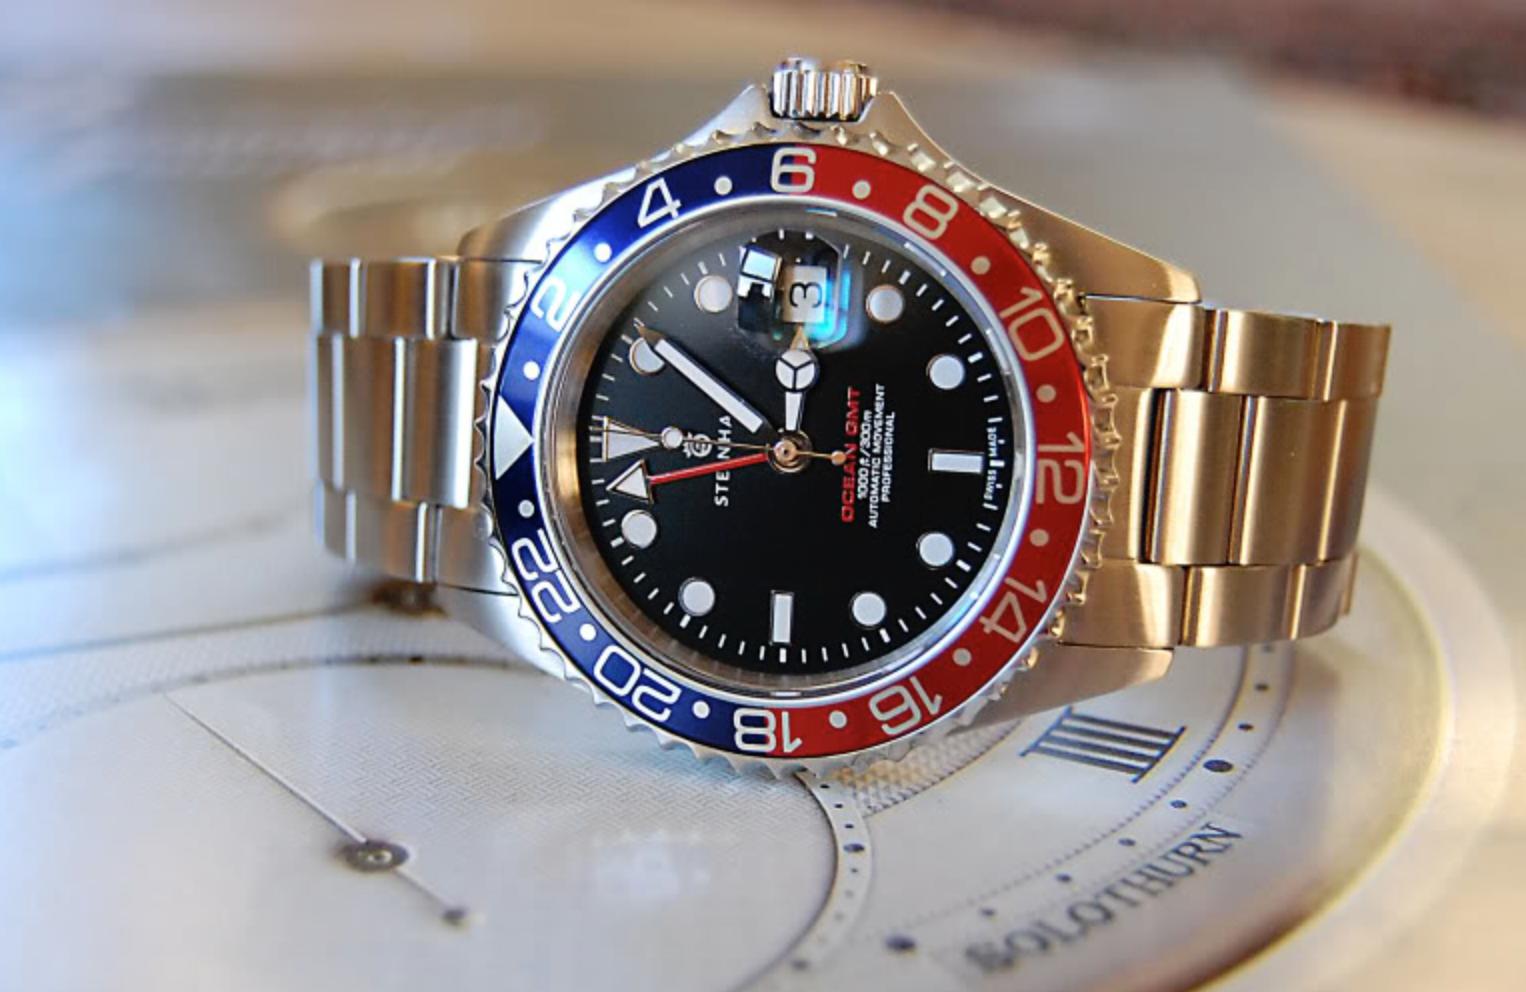 GMT: C-segment Wrist Watches: Pulled The Trigger : Seiko Pepsi